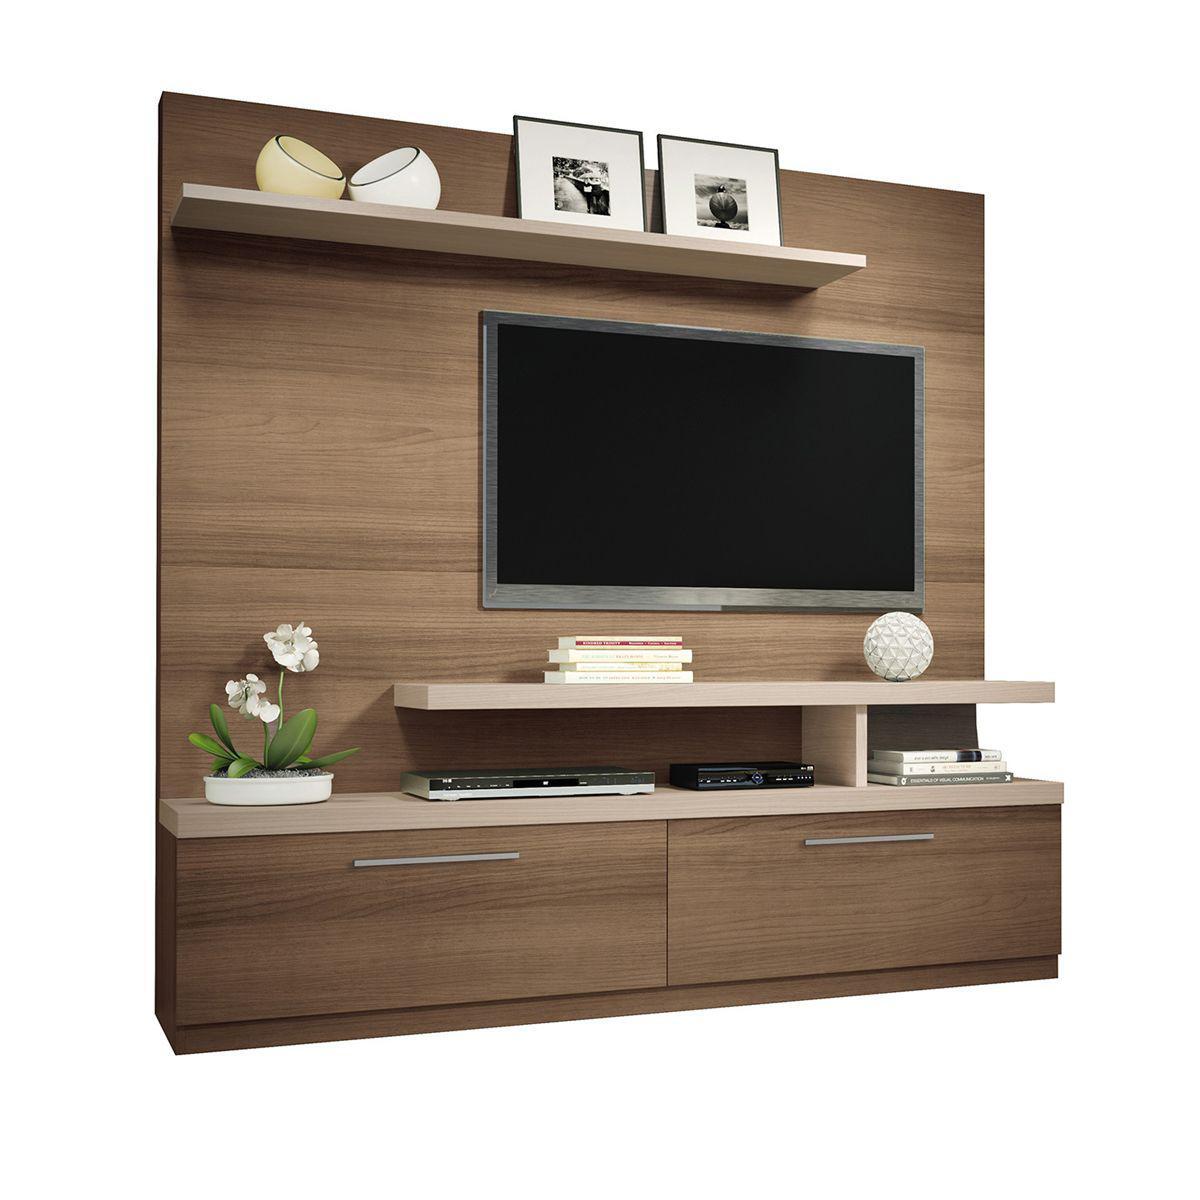 rack home theater maxx para tv at 55 polegadas hb m veis m veis para sala de estar magazine. Black Bedroom Furniture Sets. Home Design Ideas